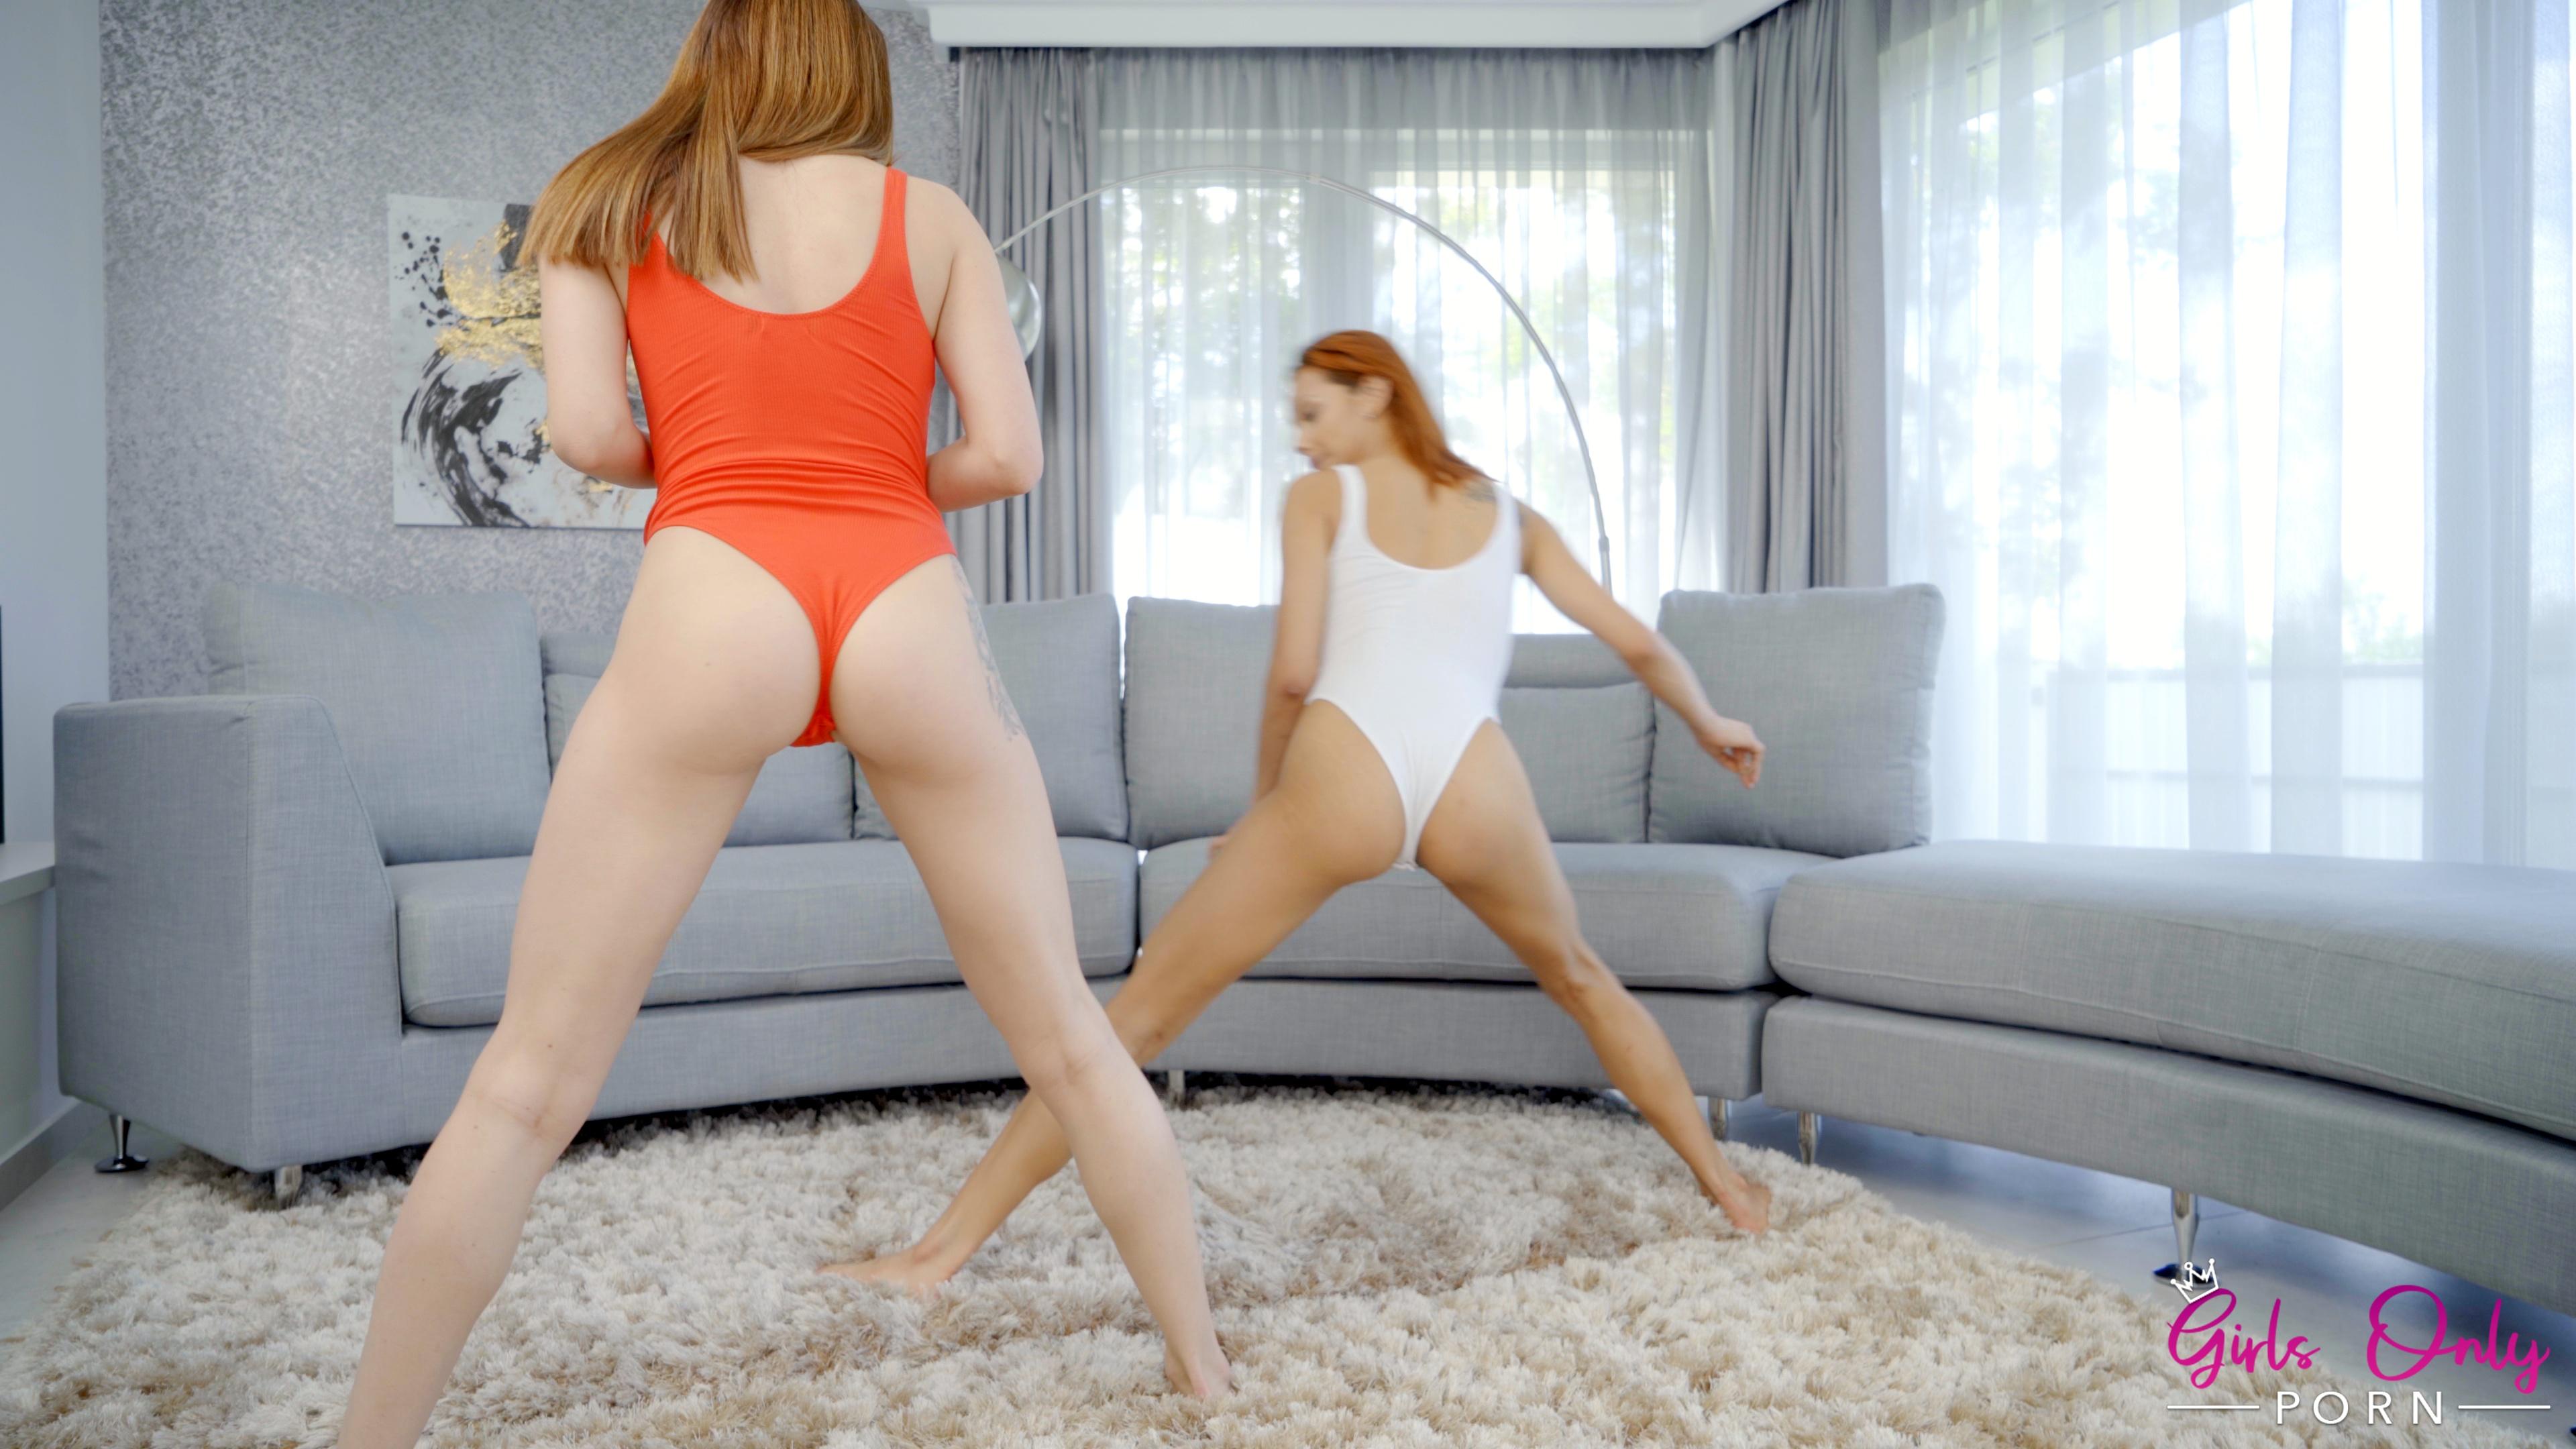 GirlsOnlyPorn.com - Alya Stark,Veronica Leal: My Yoga Instructor - S1:E2